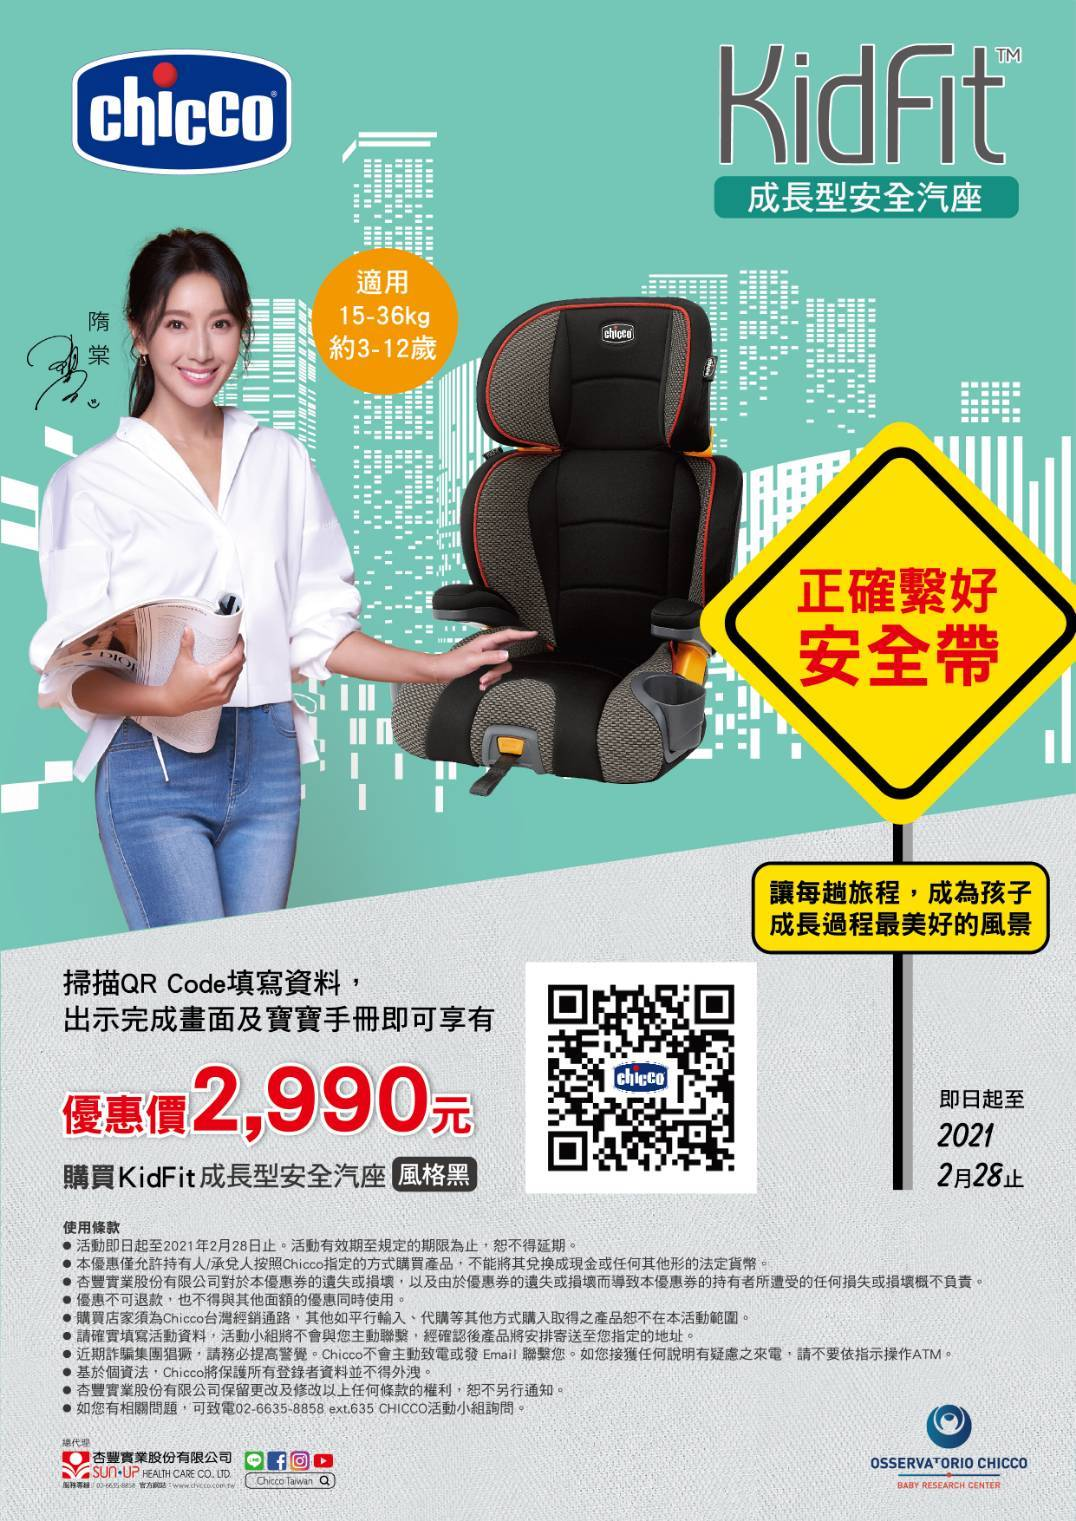 Chicco KidFit成長型安全汽座(寶礦灰) CBB79014.99 3680元(來電另享優惠-2/28止)